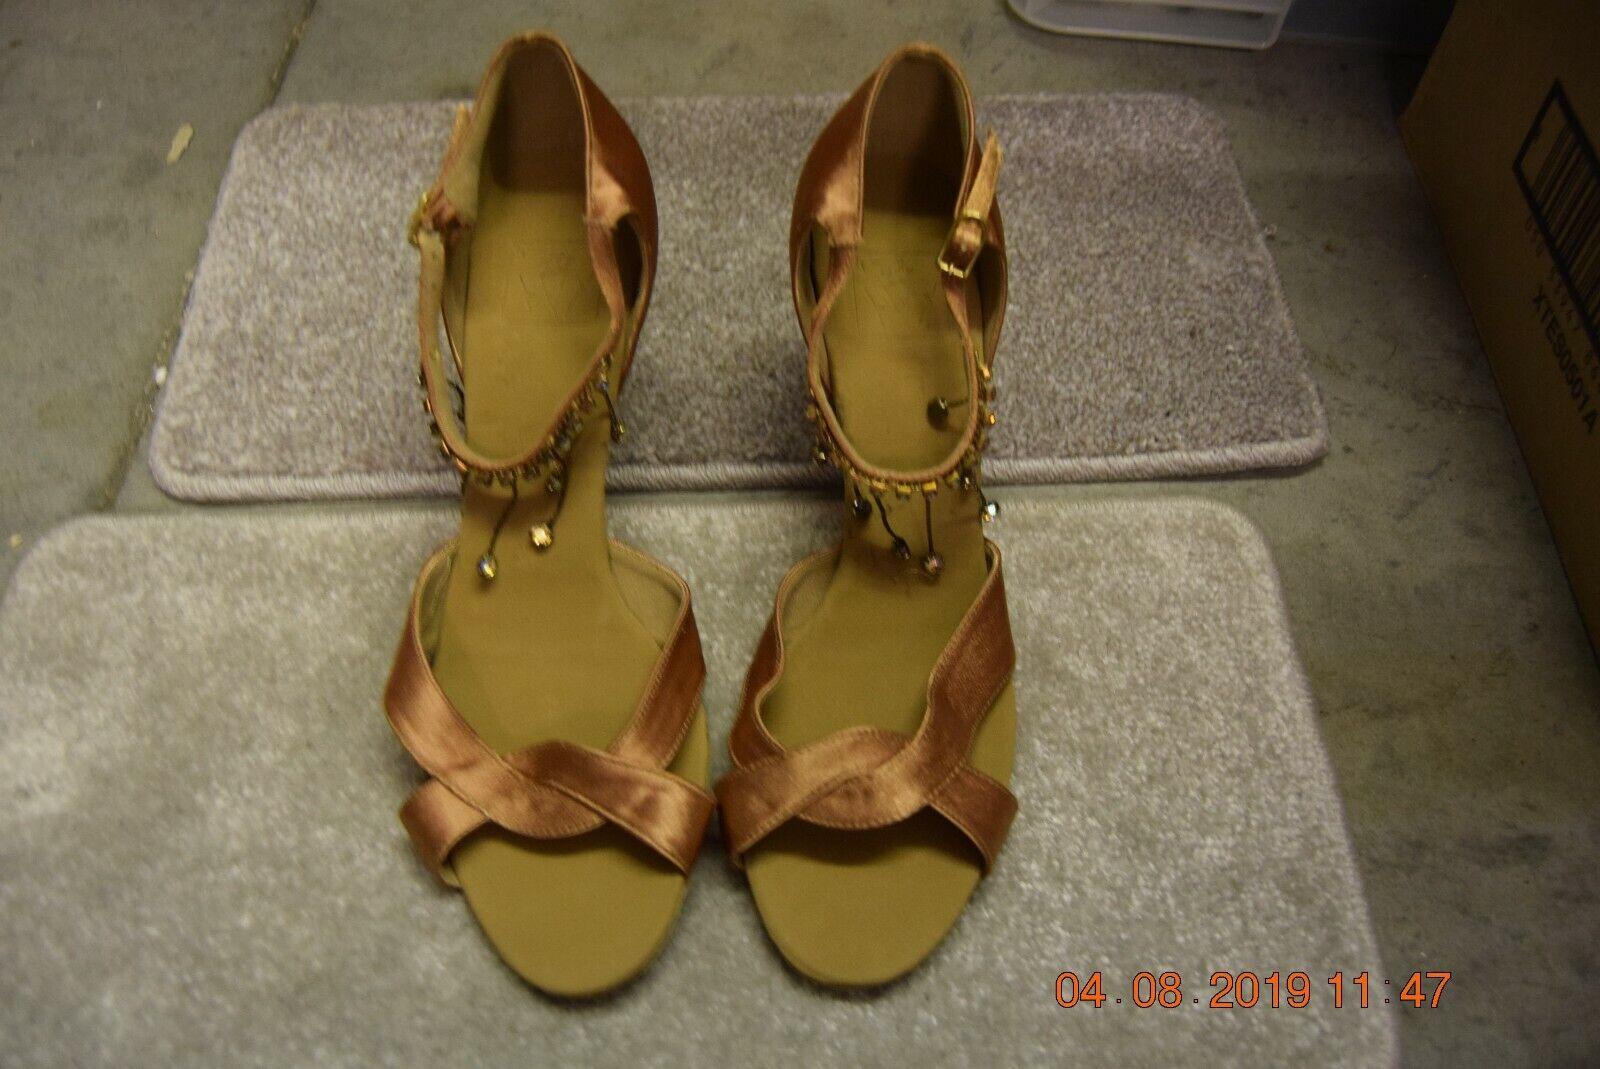 Bronze satin Dancelife ballroom / latin dance shoes - size UK 8.5 (P107)